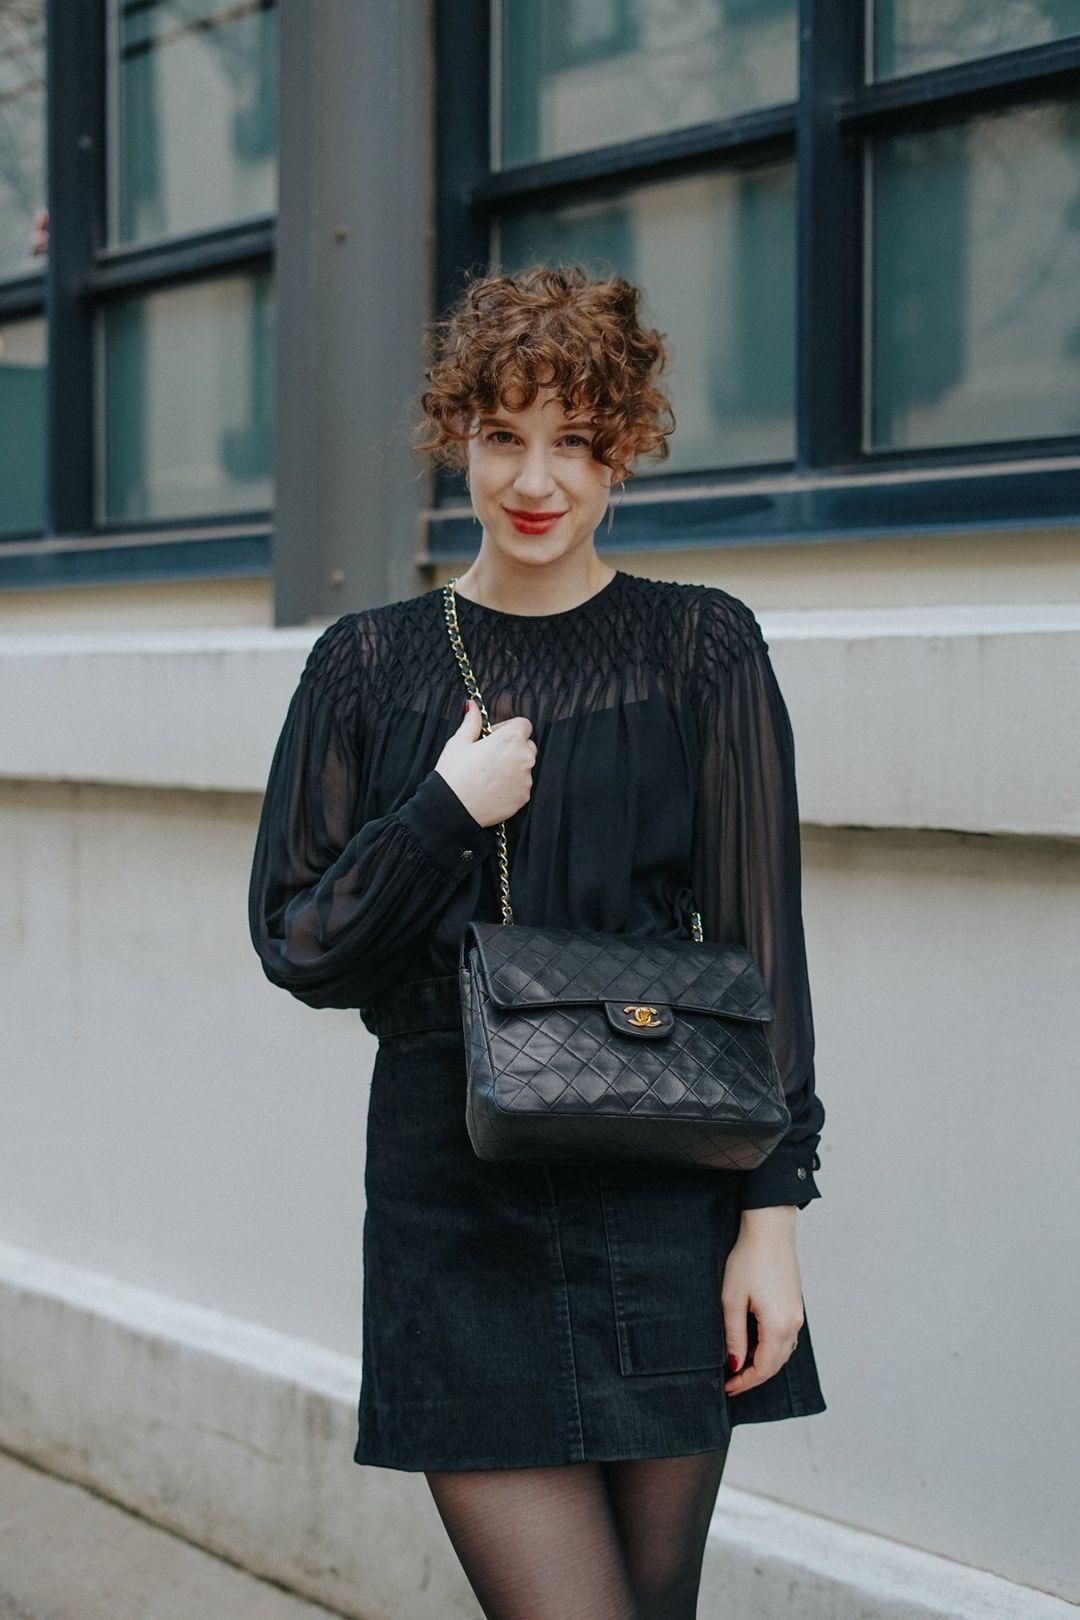 Buying vintage luxury handbags